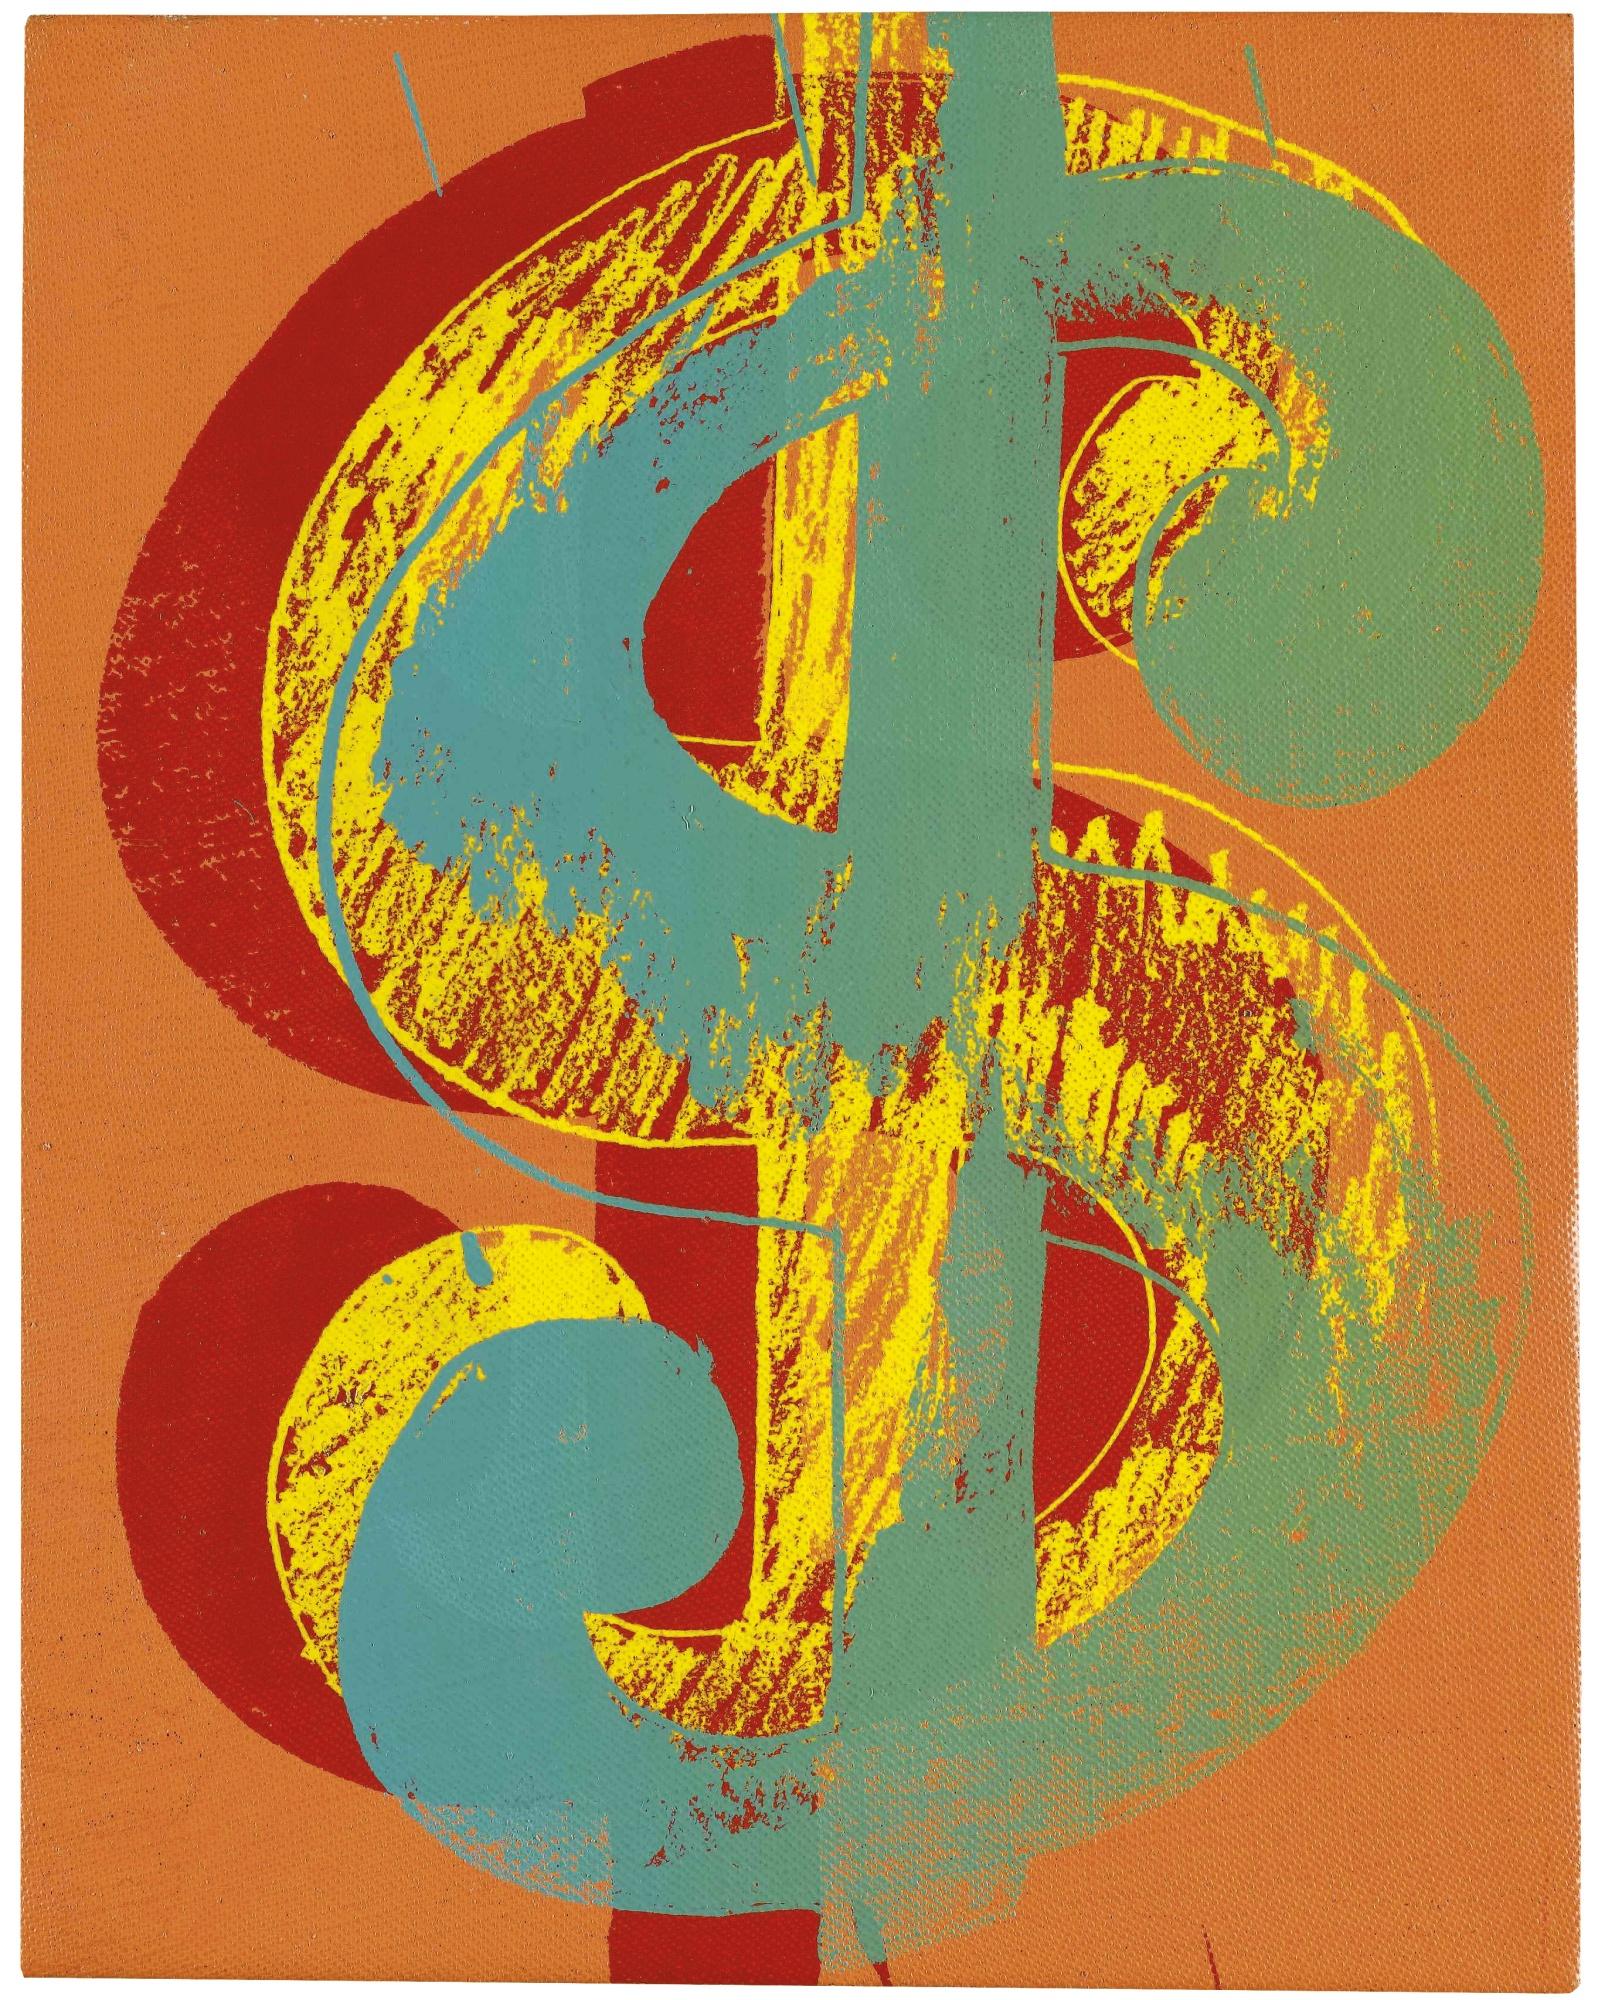 Andy Warhol-Dollar Sign-1980